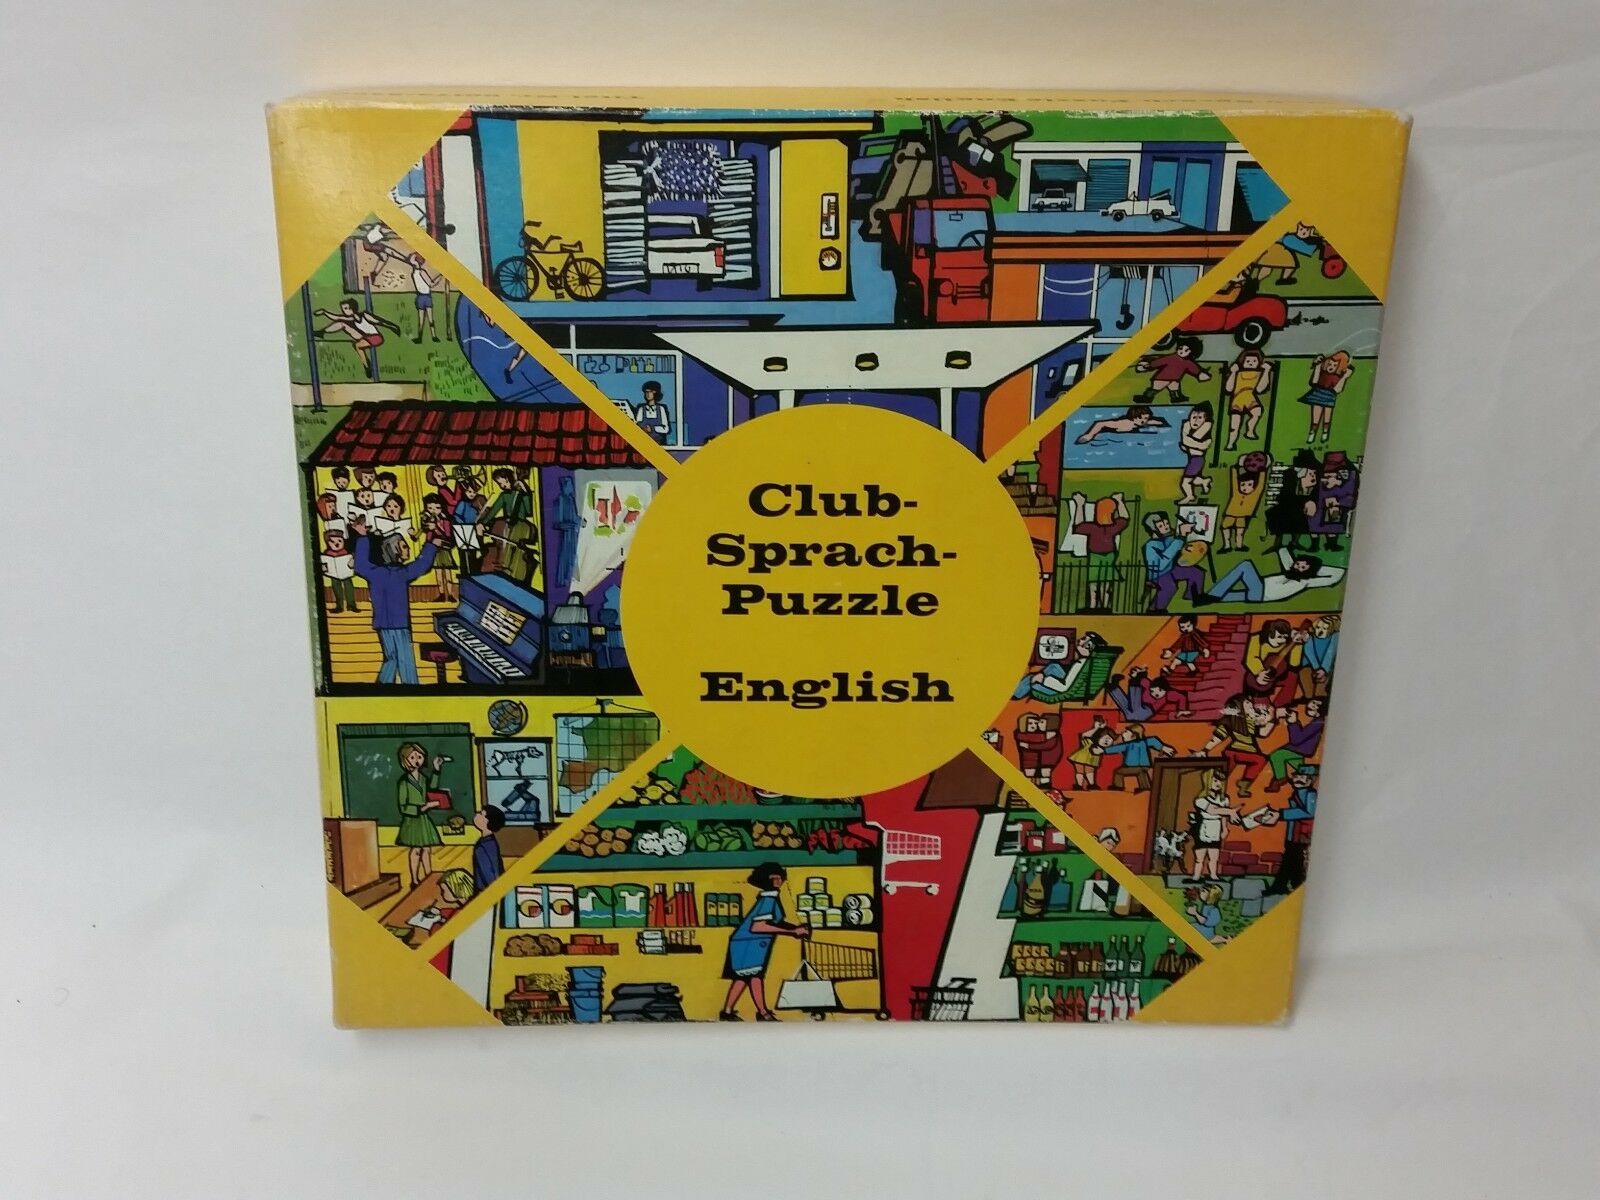 Club-Sprach-Puzzle Club-Sprach-Puzzle Club-Sprach-Puzzle Inglés - Alemán - Rareza Von Visaphon 1973 6c5738